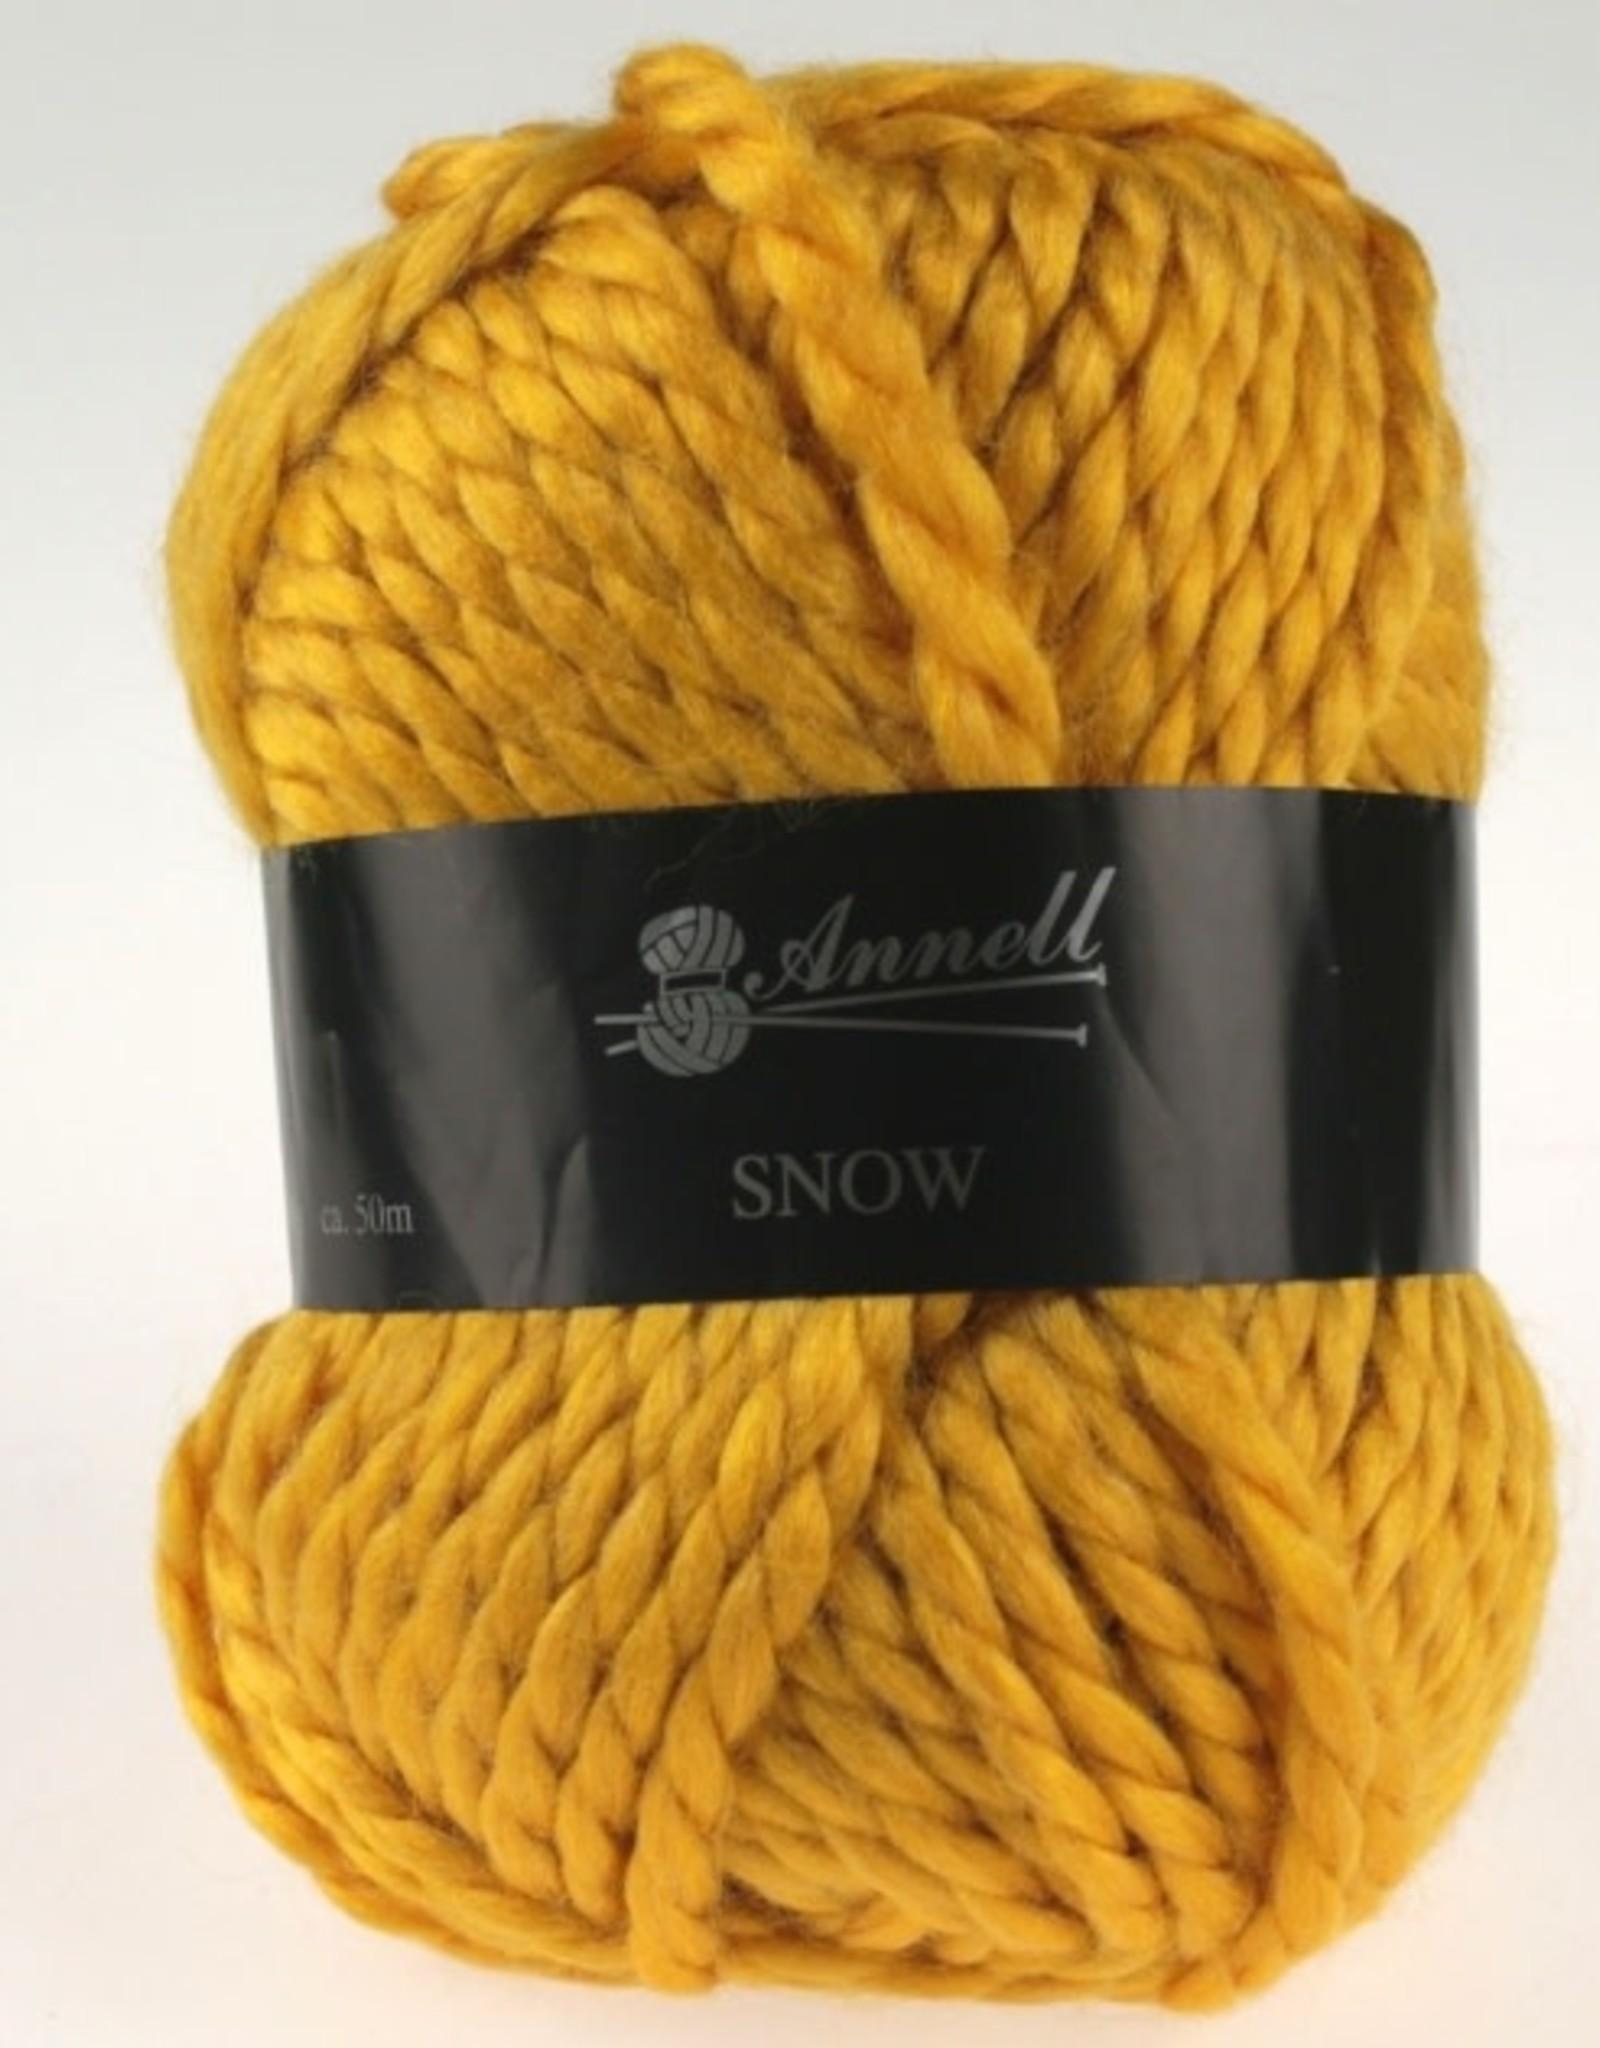 Annell Annell Snow 3915